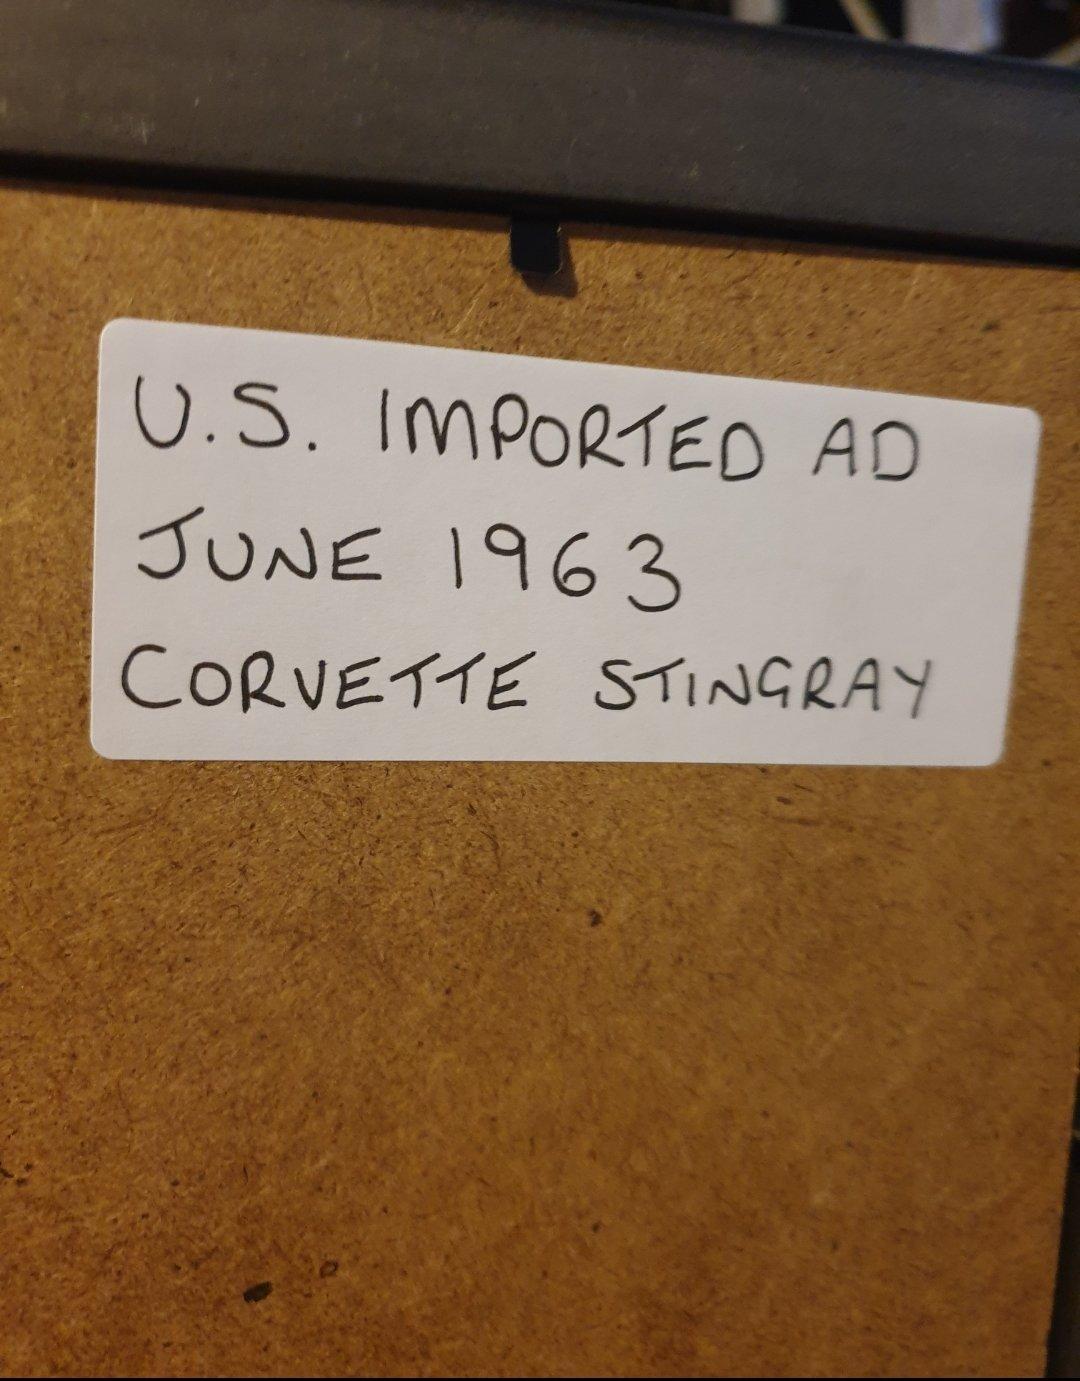 1963 Corvette Stingray Advert Original  For Sale (picture 2 of 2)